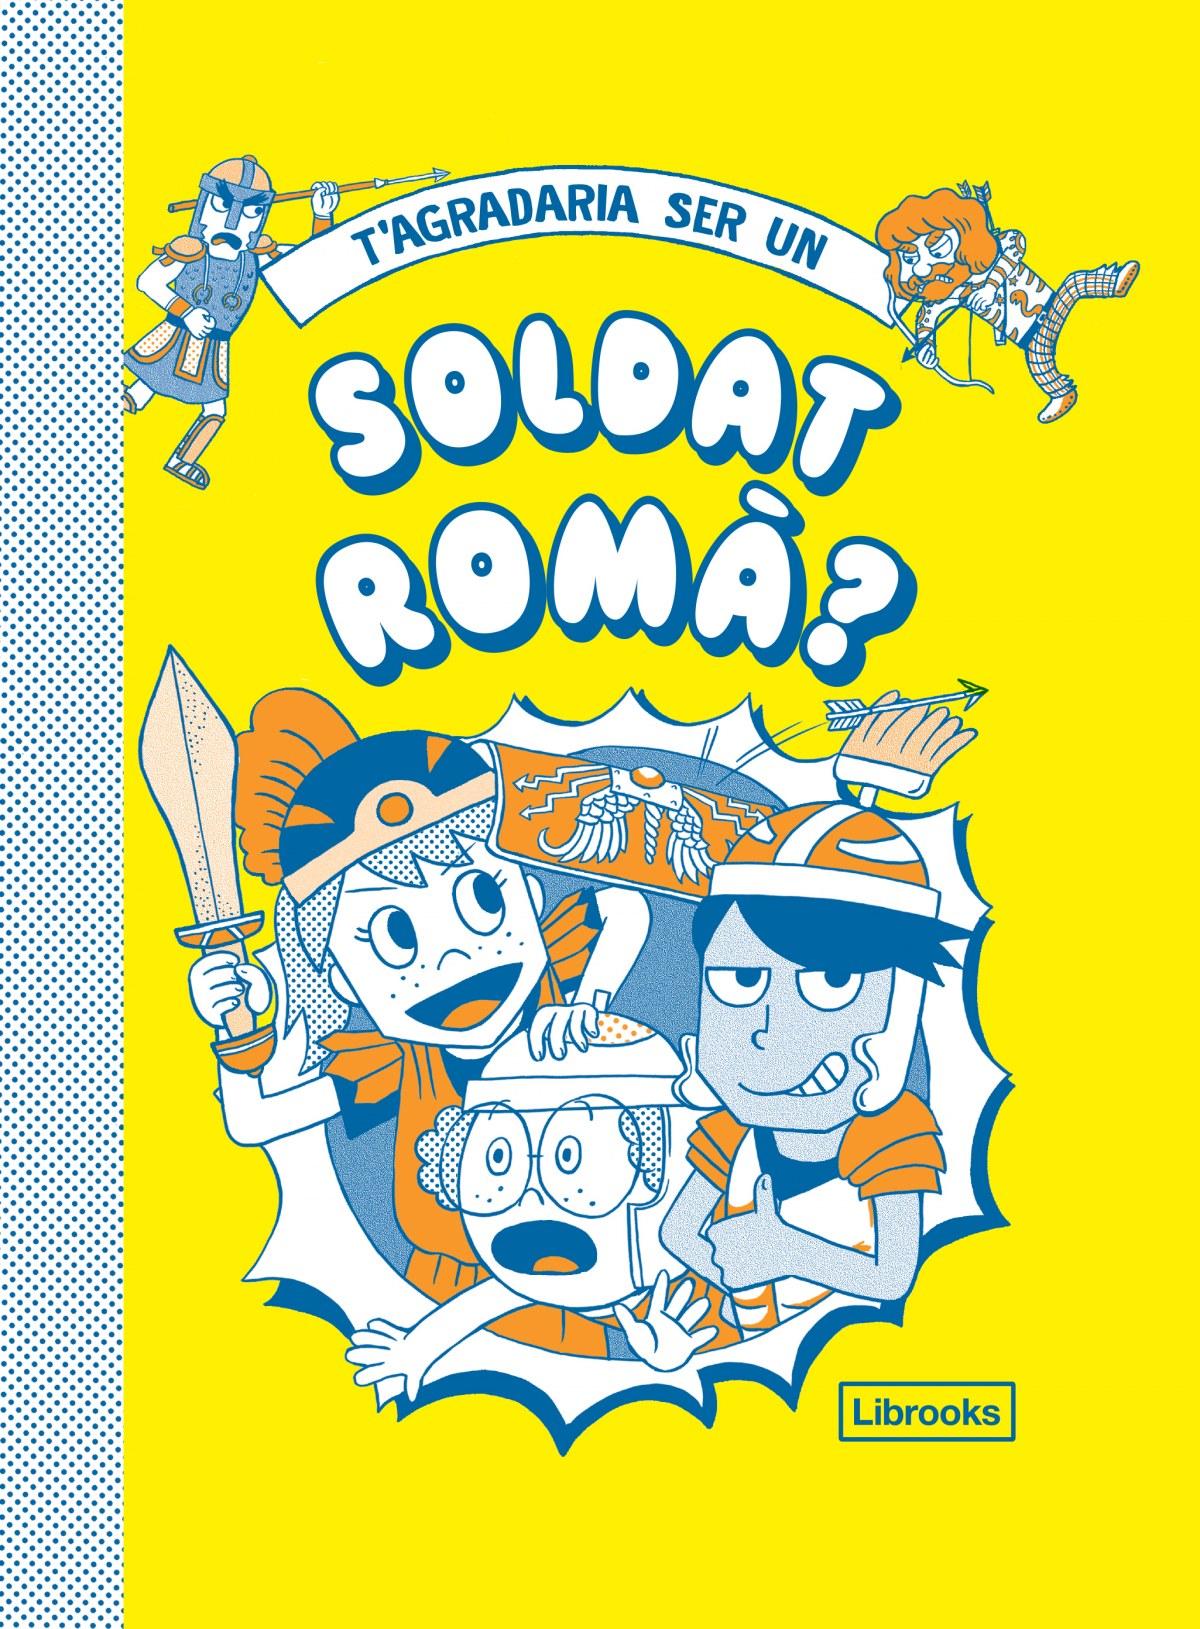 T'agradaria ser un soldat romà?